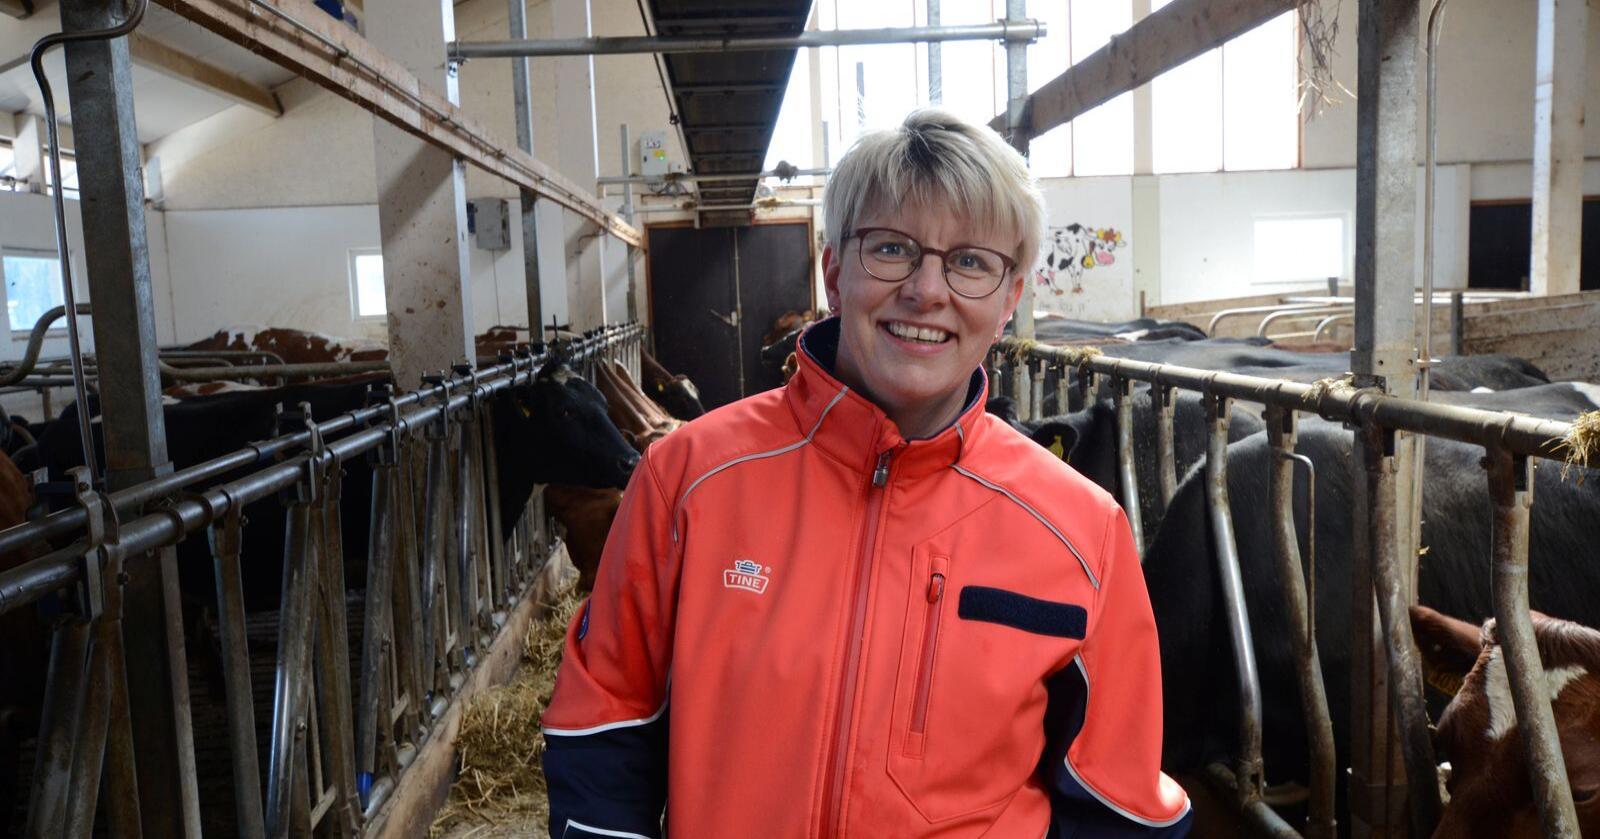 1,07: Marit Haugen er glad forholdstallet er høyt, selv om bakteppet er dystert. (Arkivfoto)